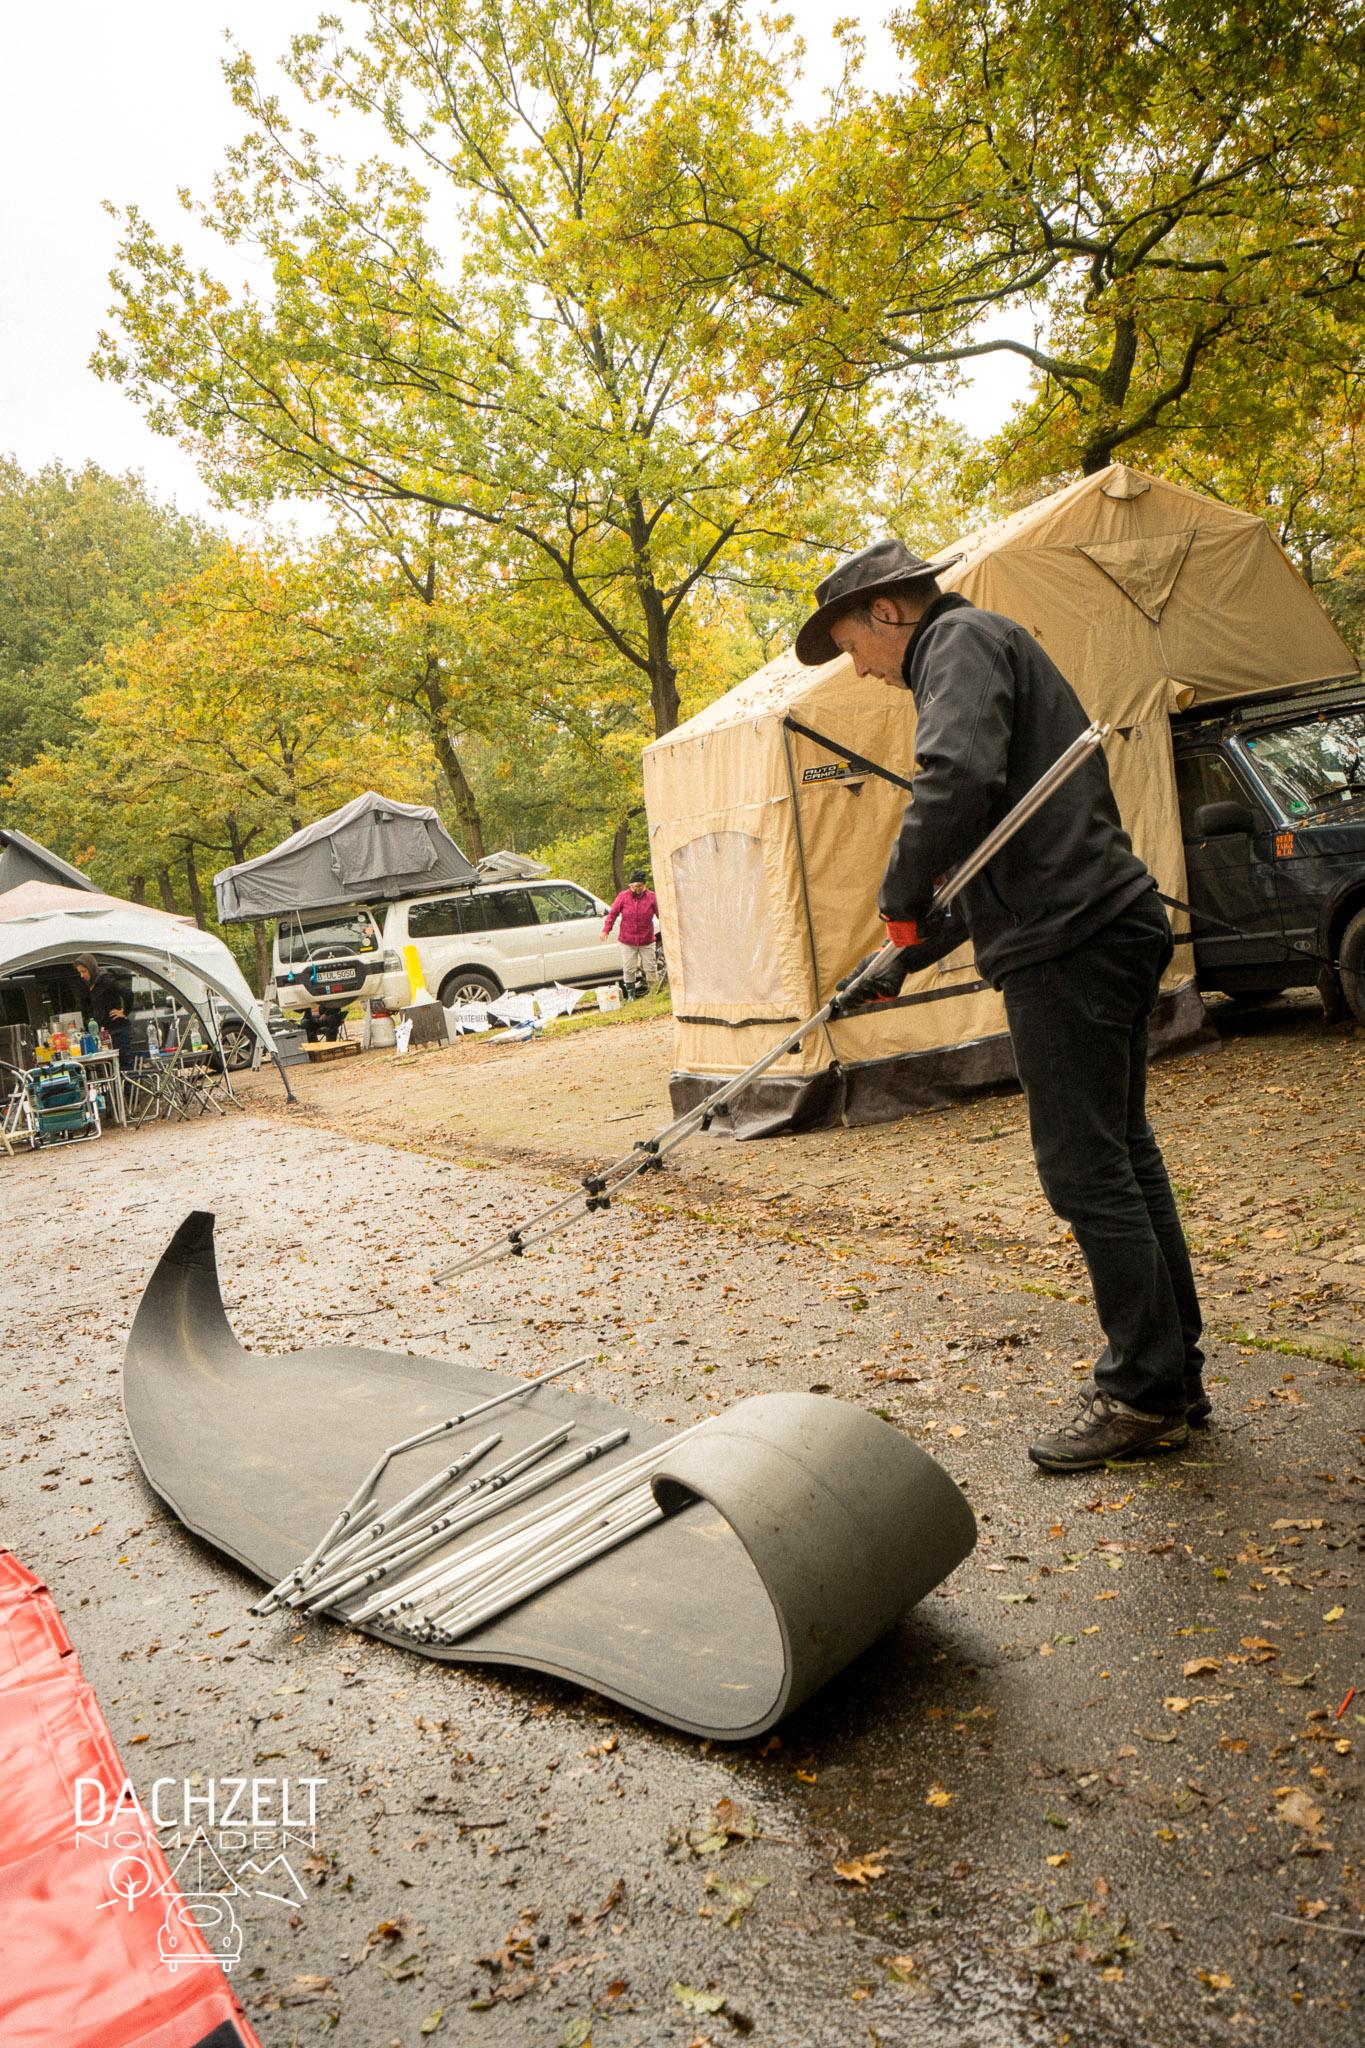 20191016-Dachzelt-Camp-Speciaal-Diana-Schandwinkel-DSC02567